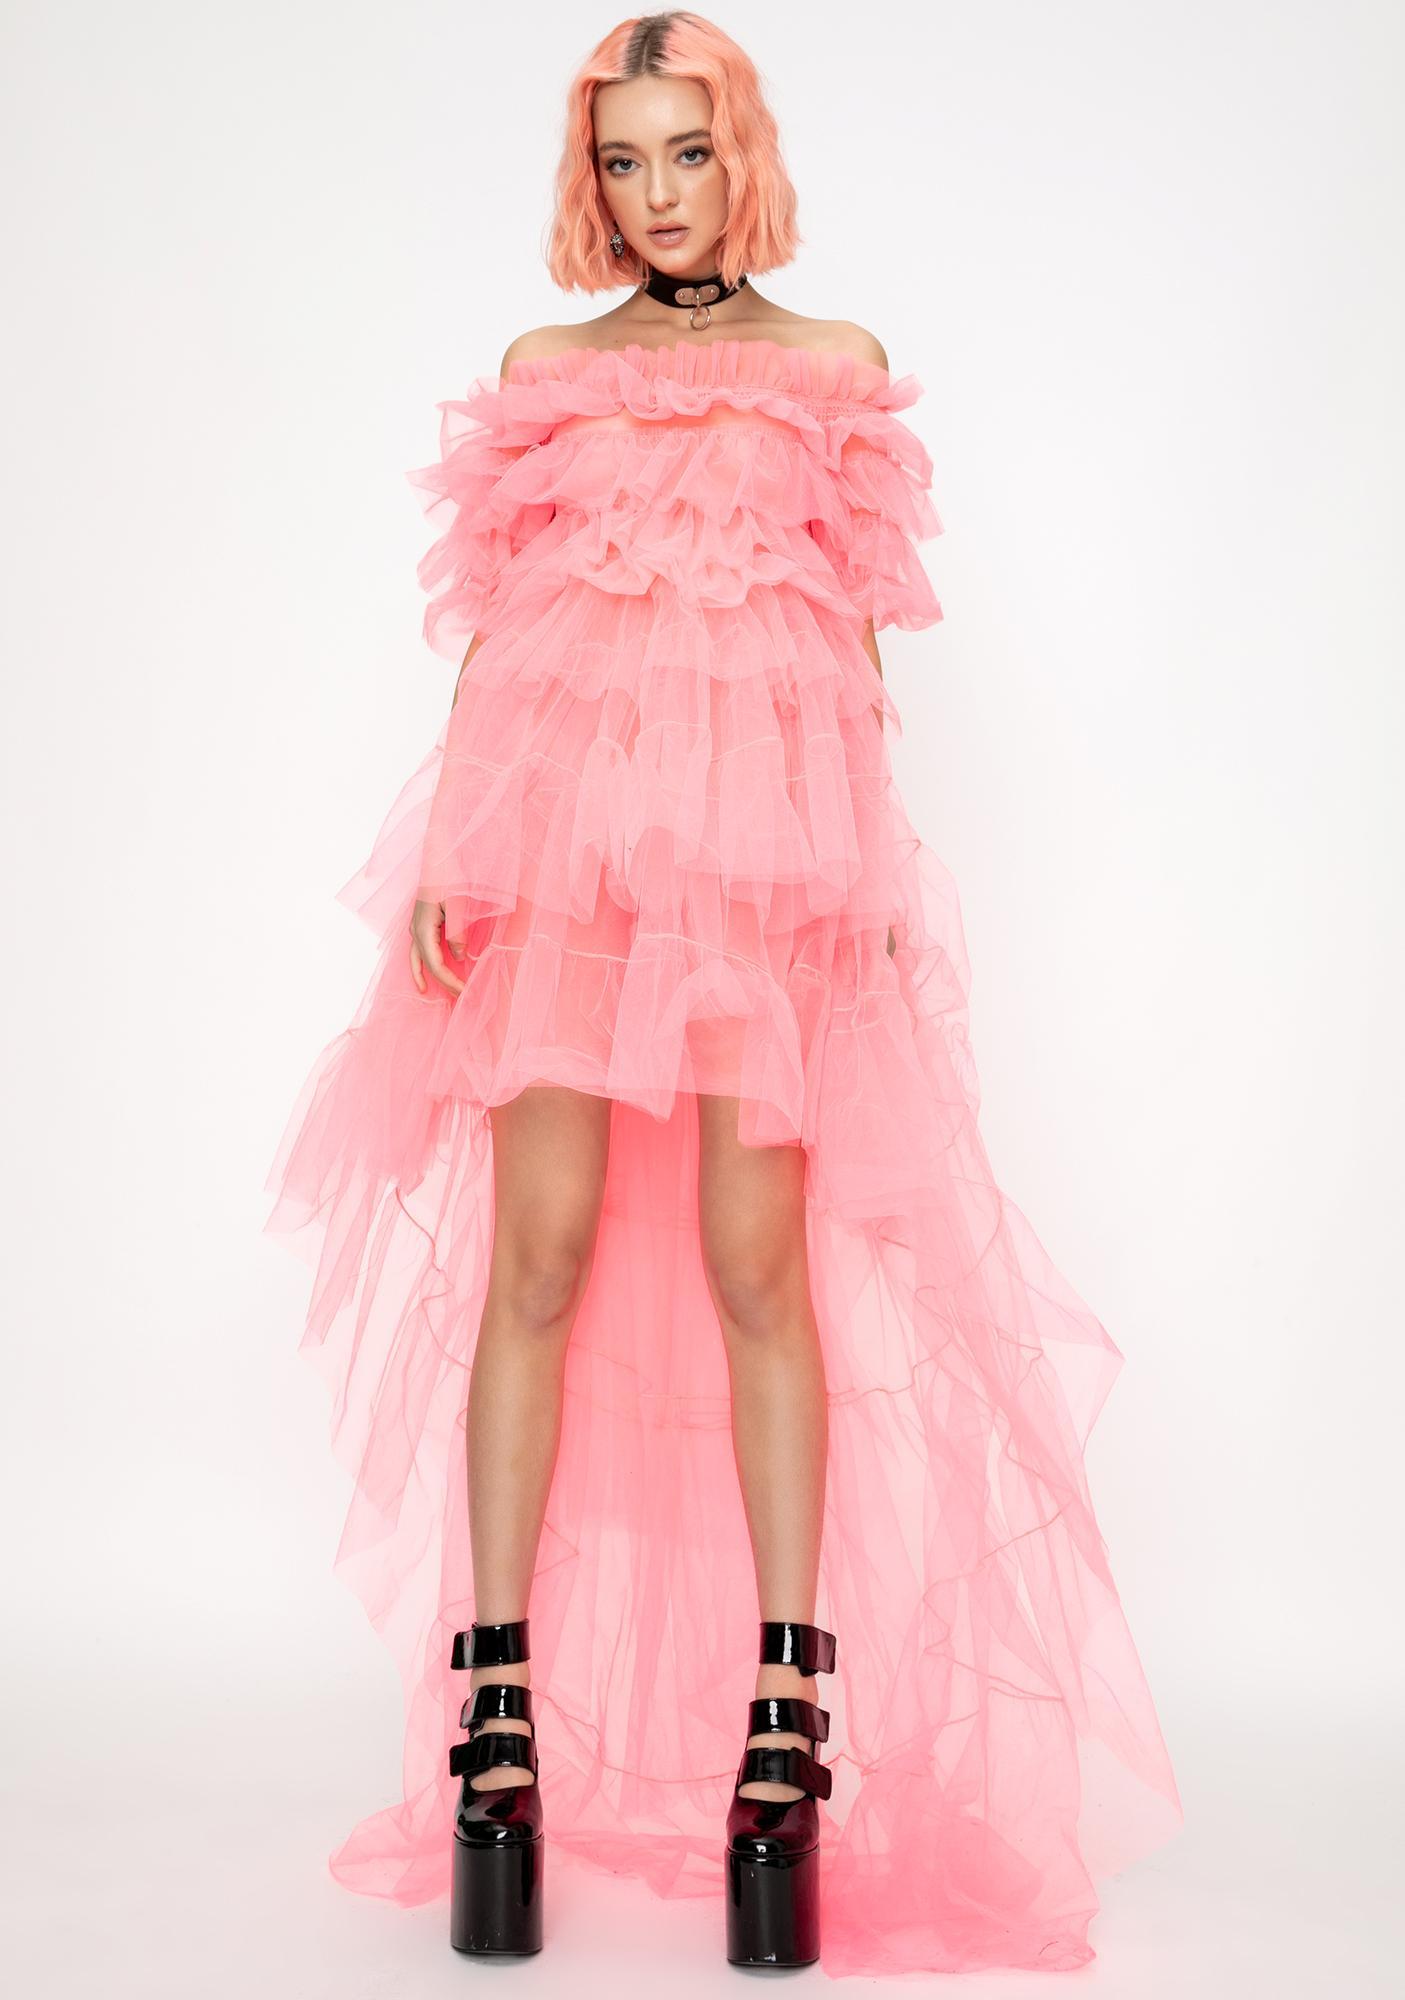 Kiki Riki Cotton Candy Princess Tulle Dress